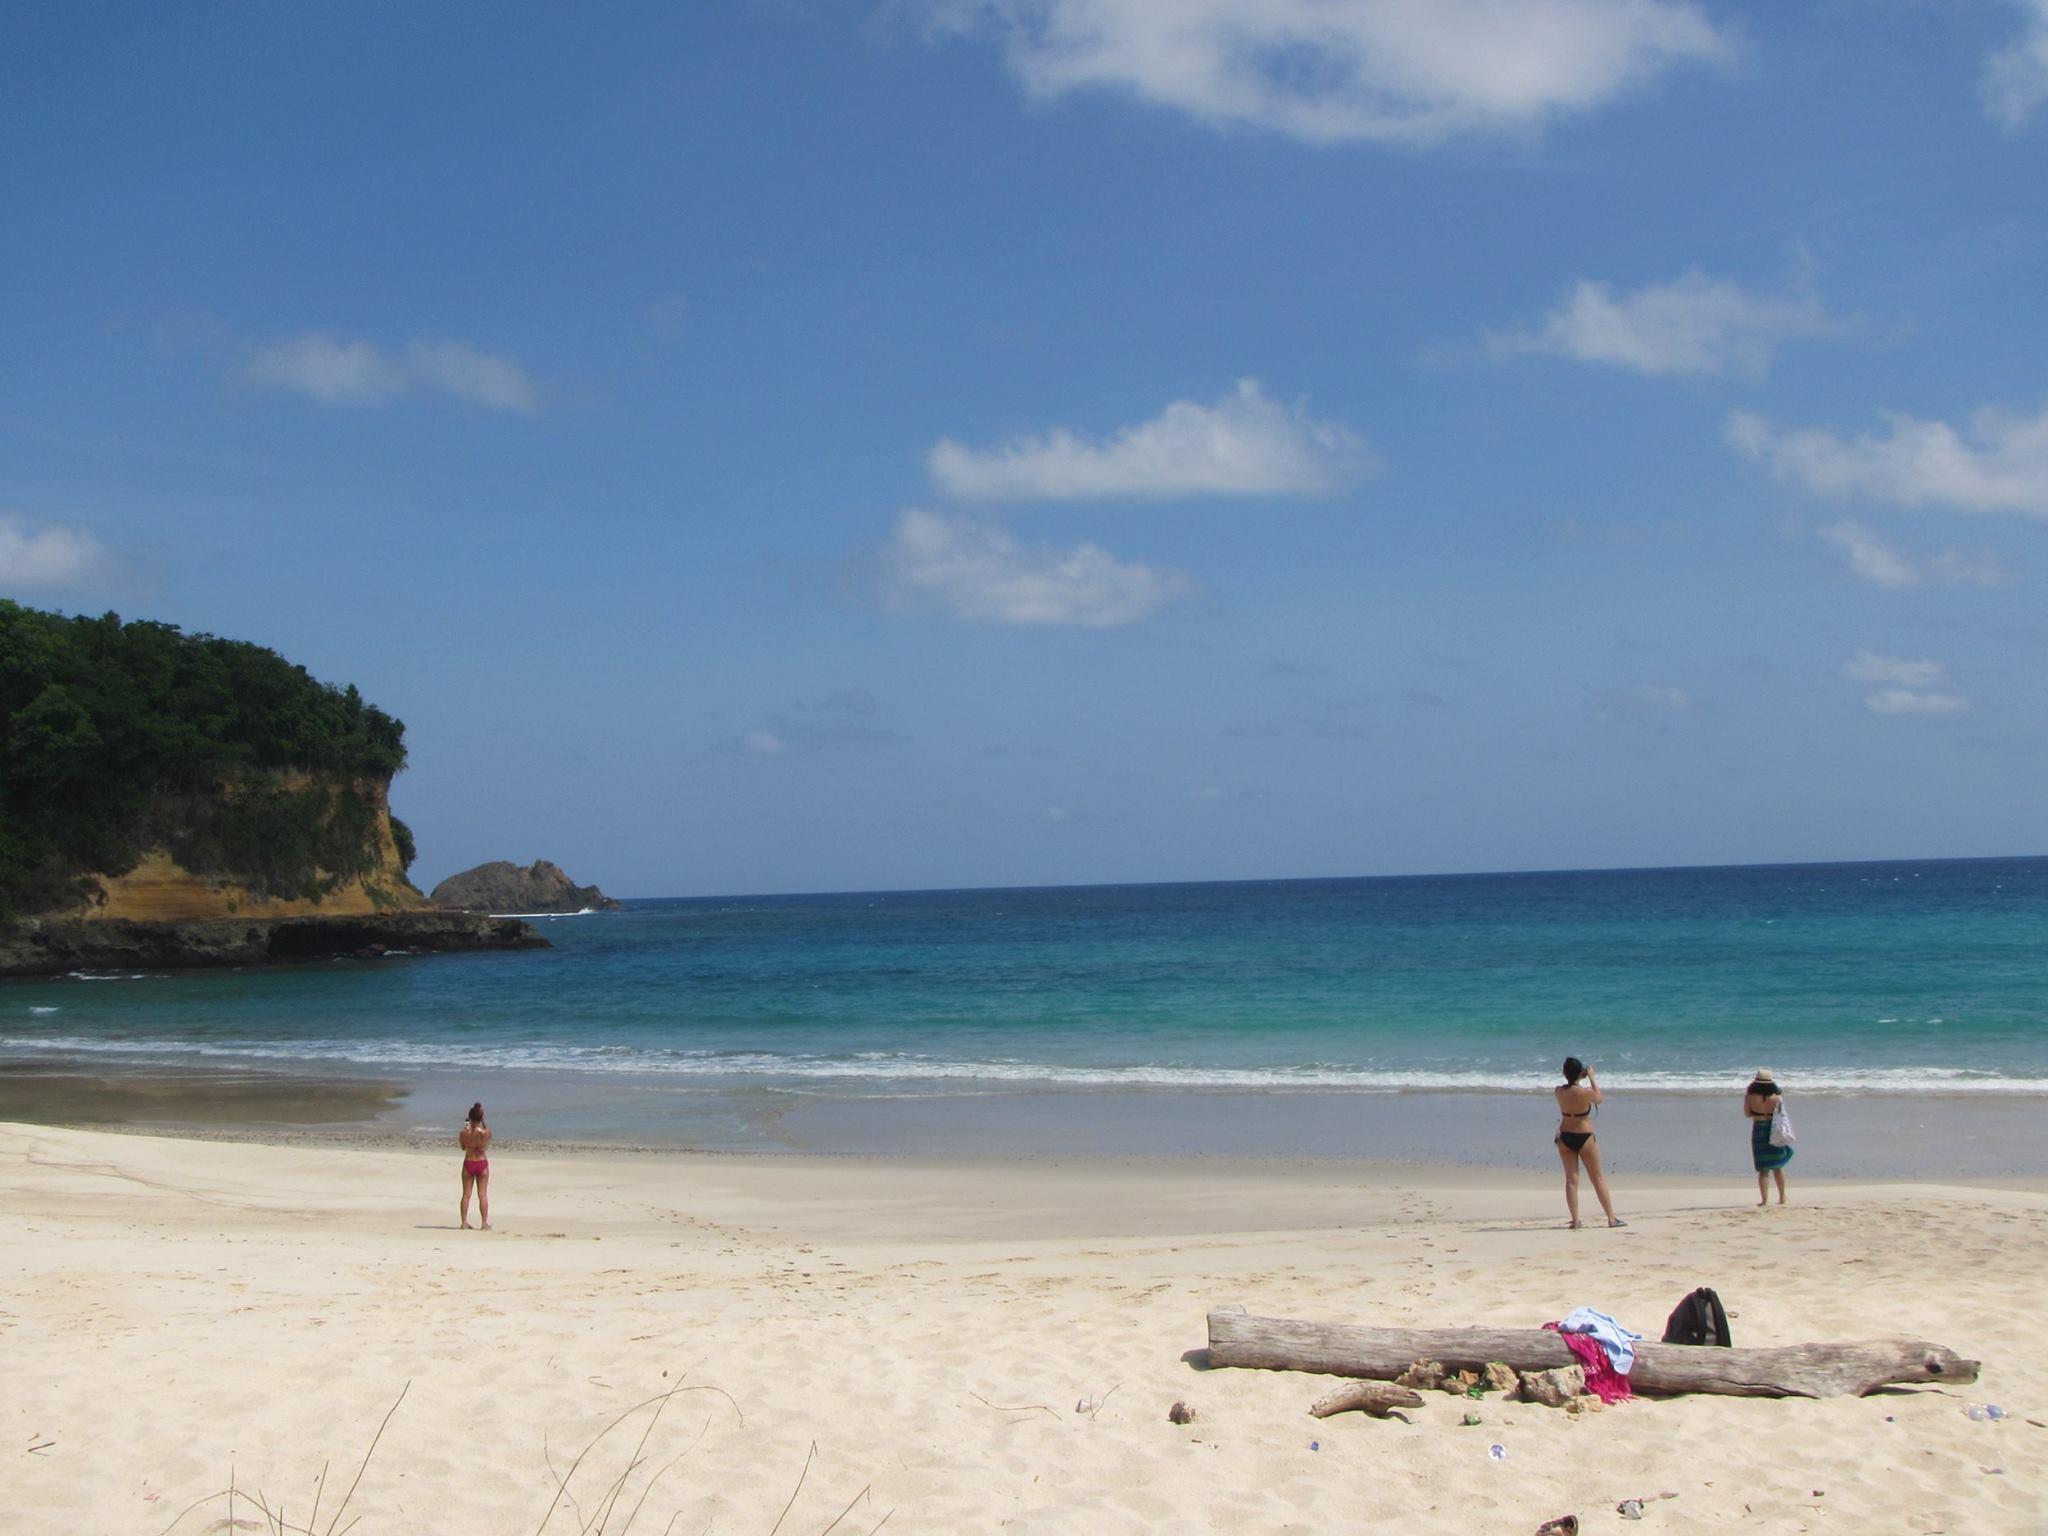 walakiri-beach-top-10-places-to-scuba-dive